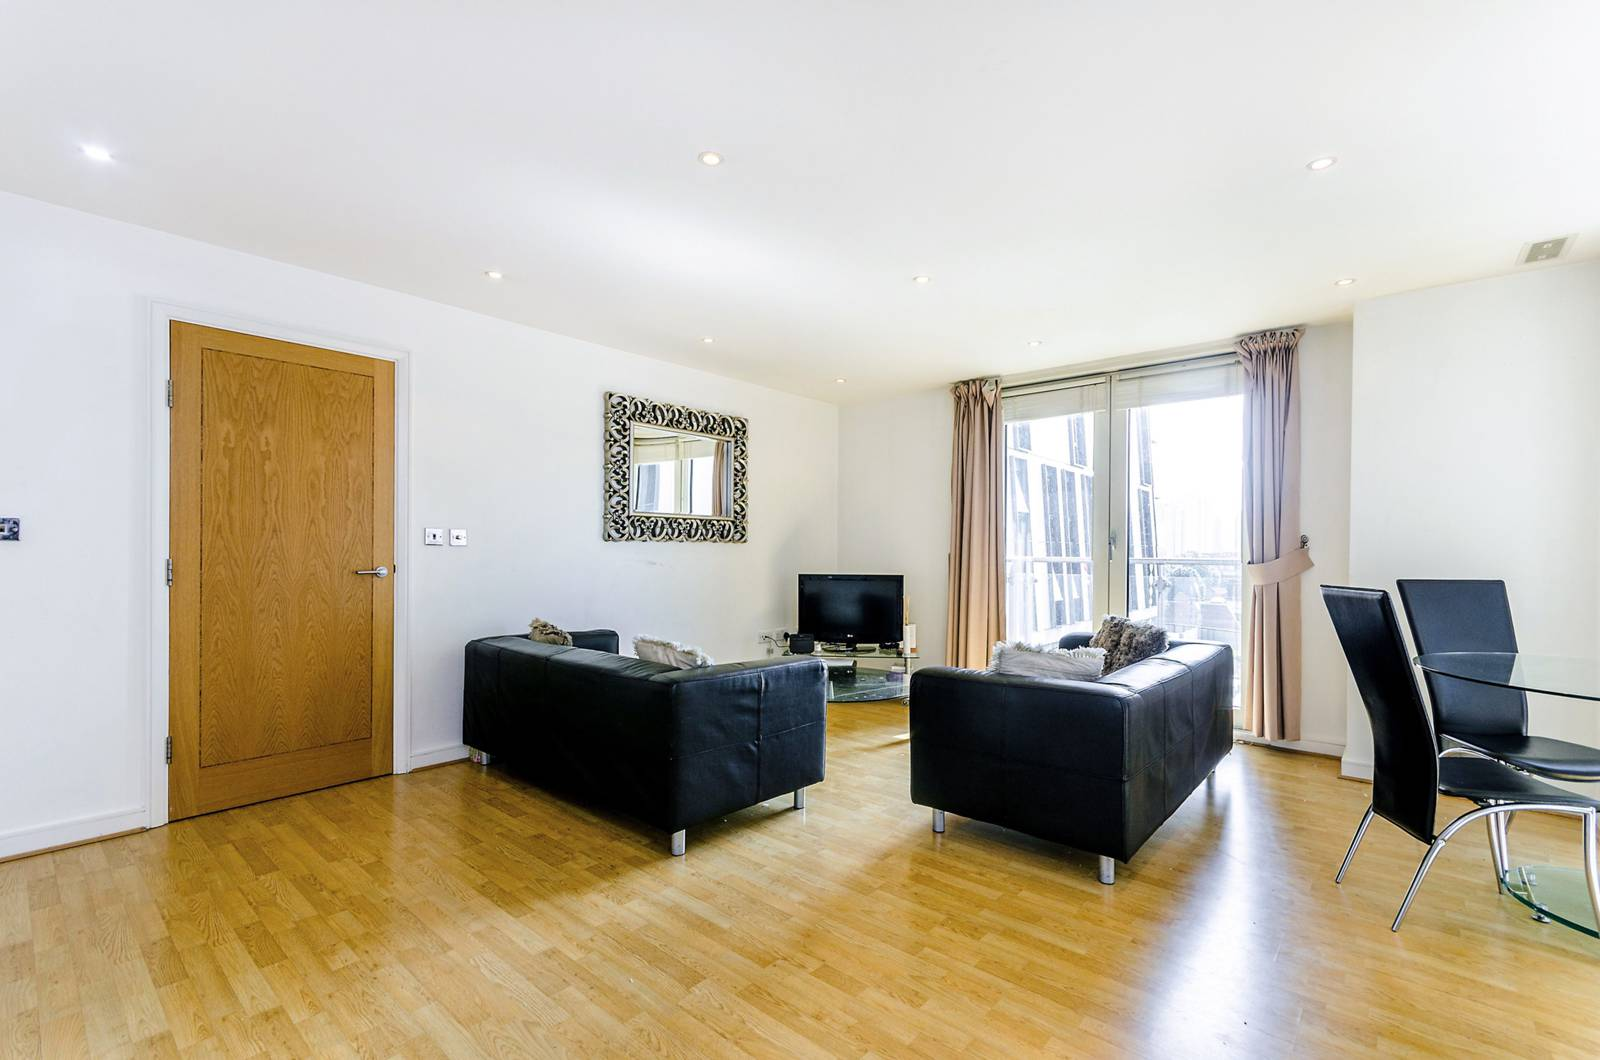 2 Bedroom Flat For Sale In Albert Embankment, Albert Embankment SE1 , London